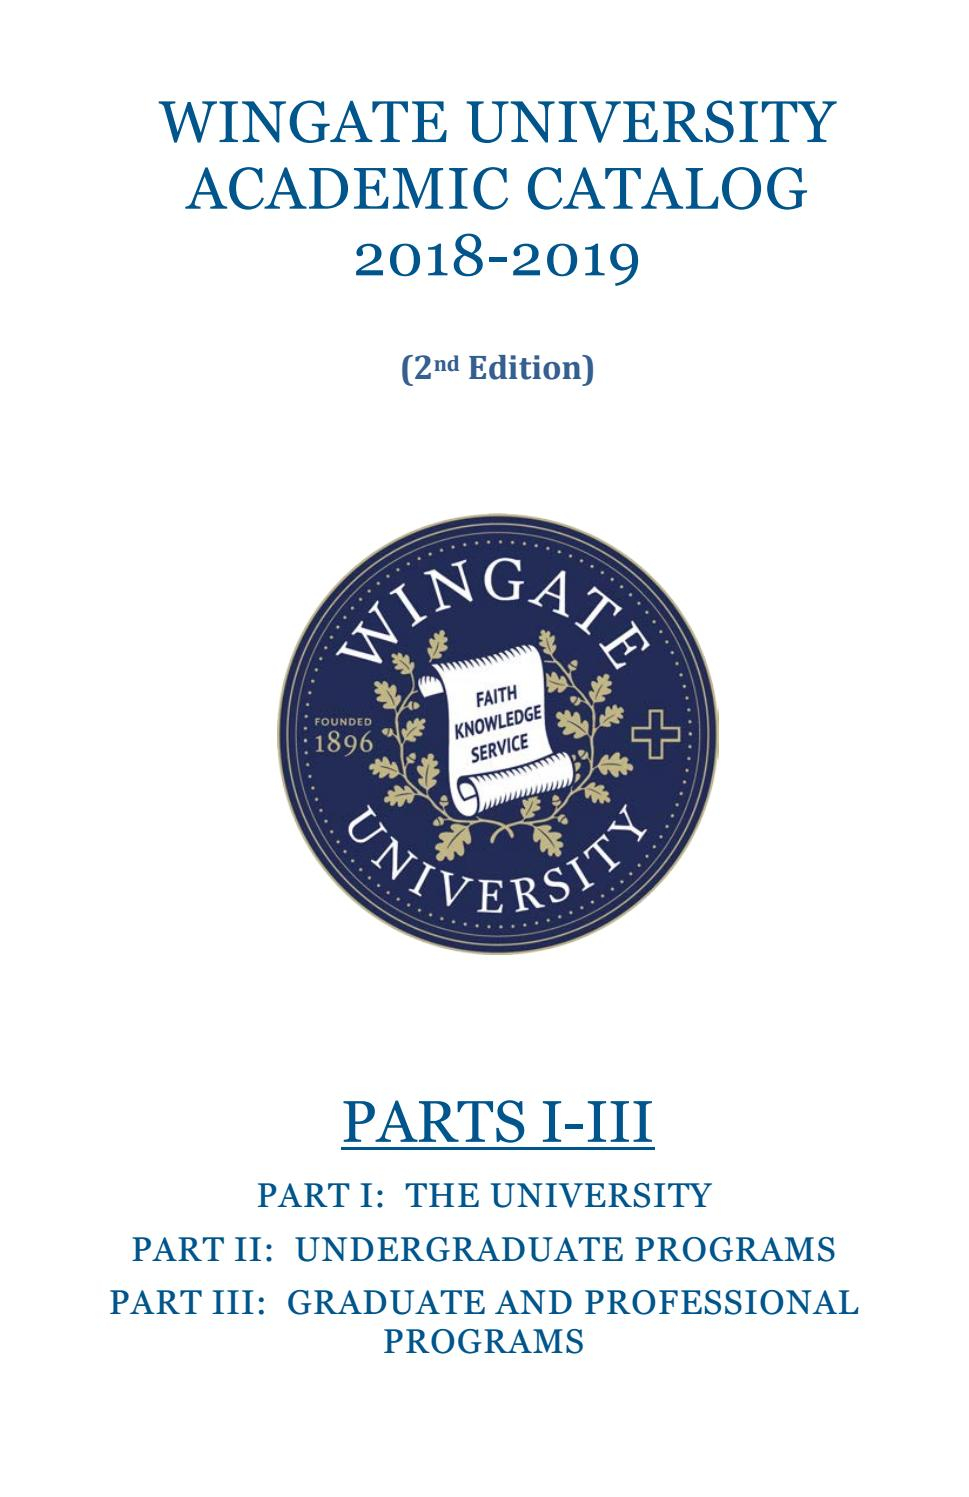 Wingate University Academic Catalog 2018 19 Second Edition Regarding University Of Glasgow Holiday Calender 2021